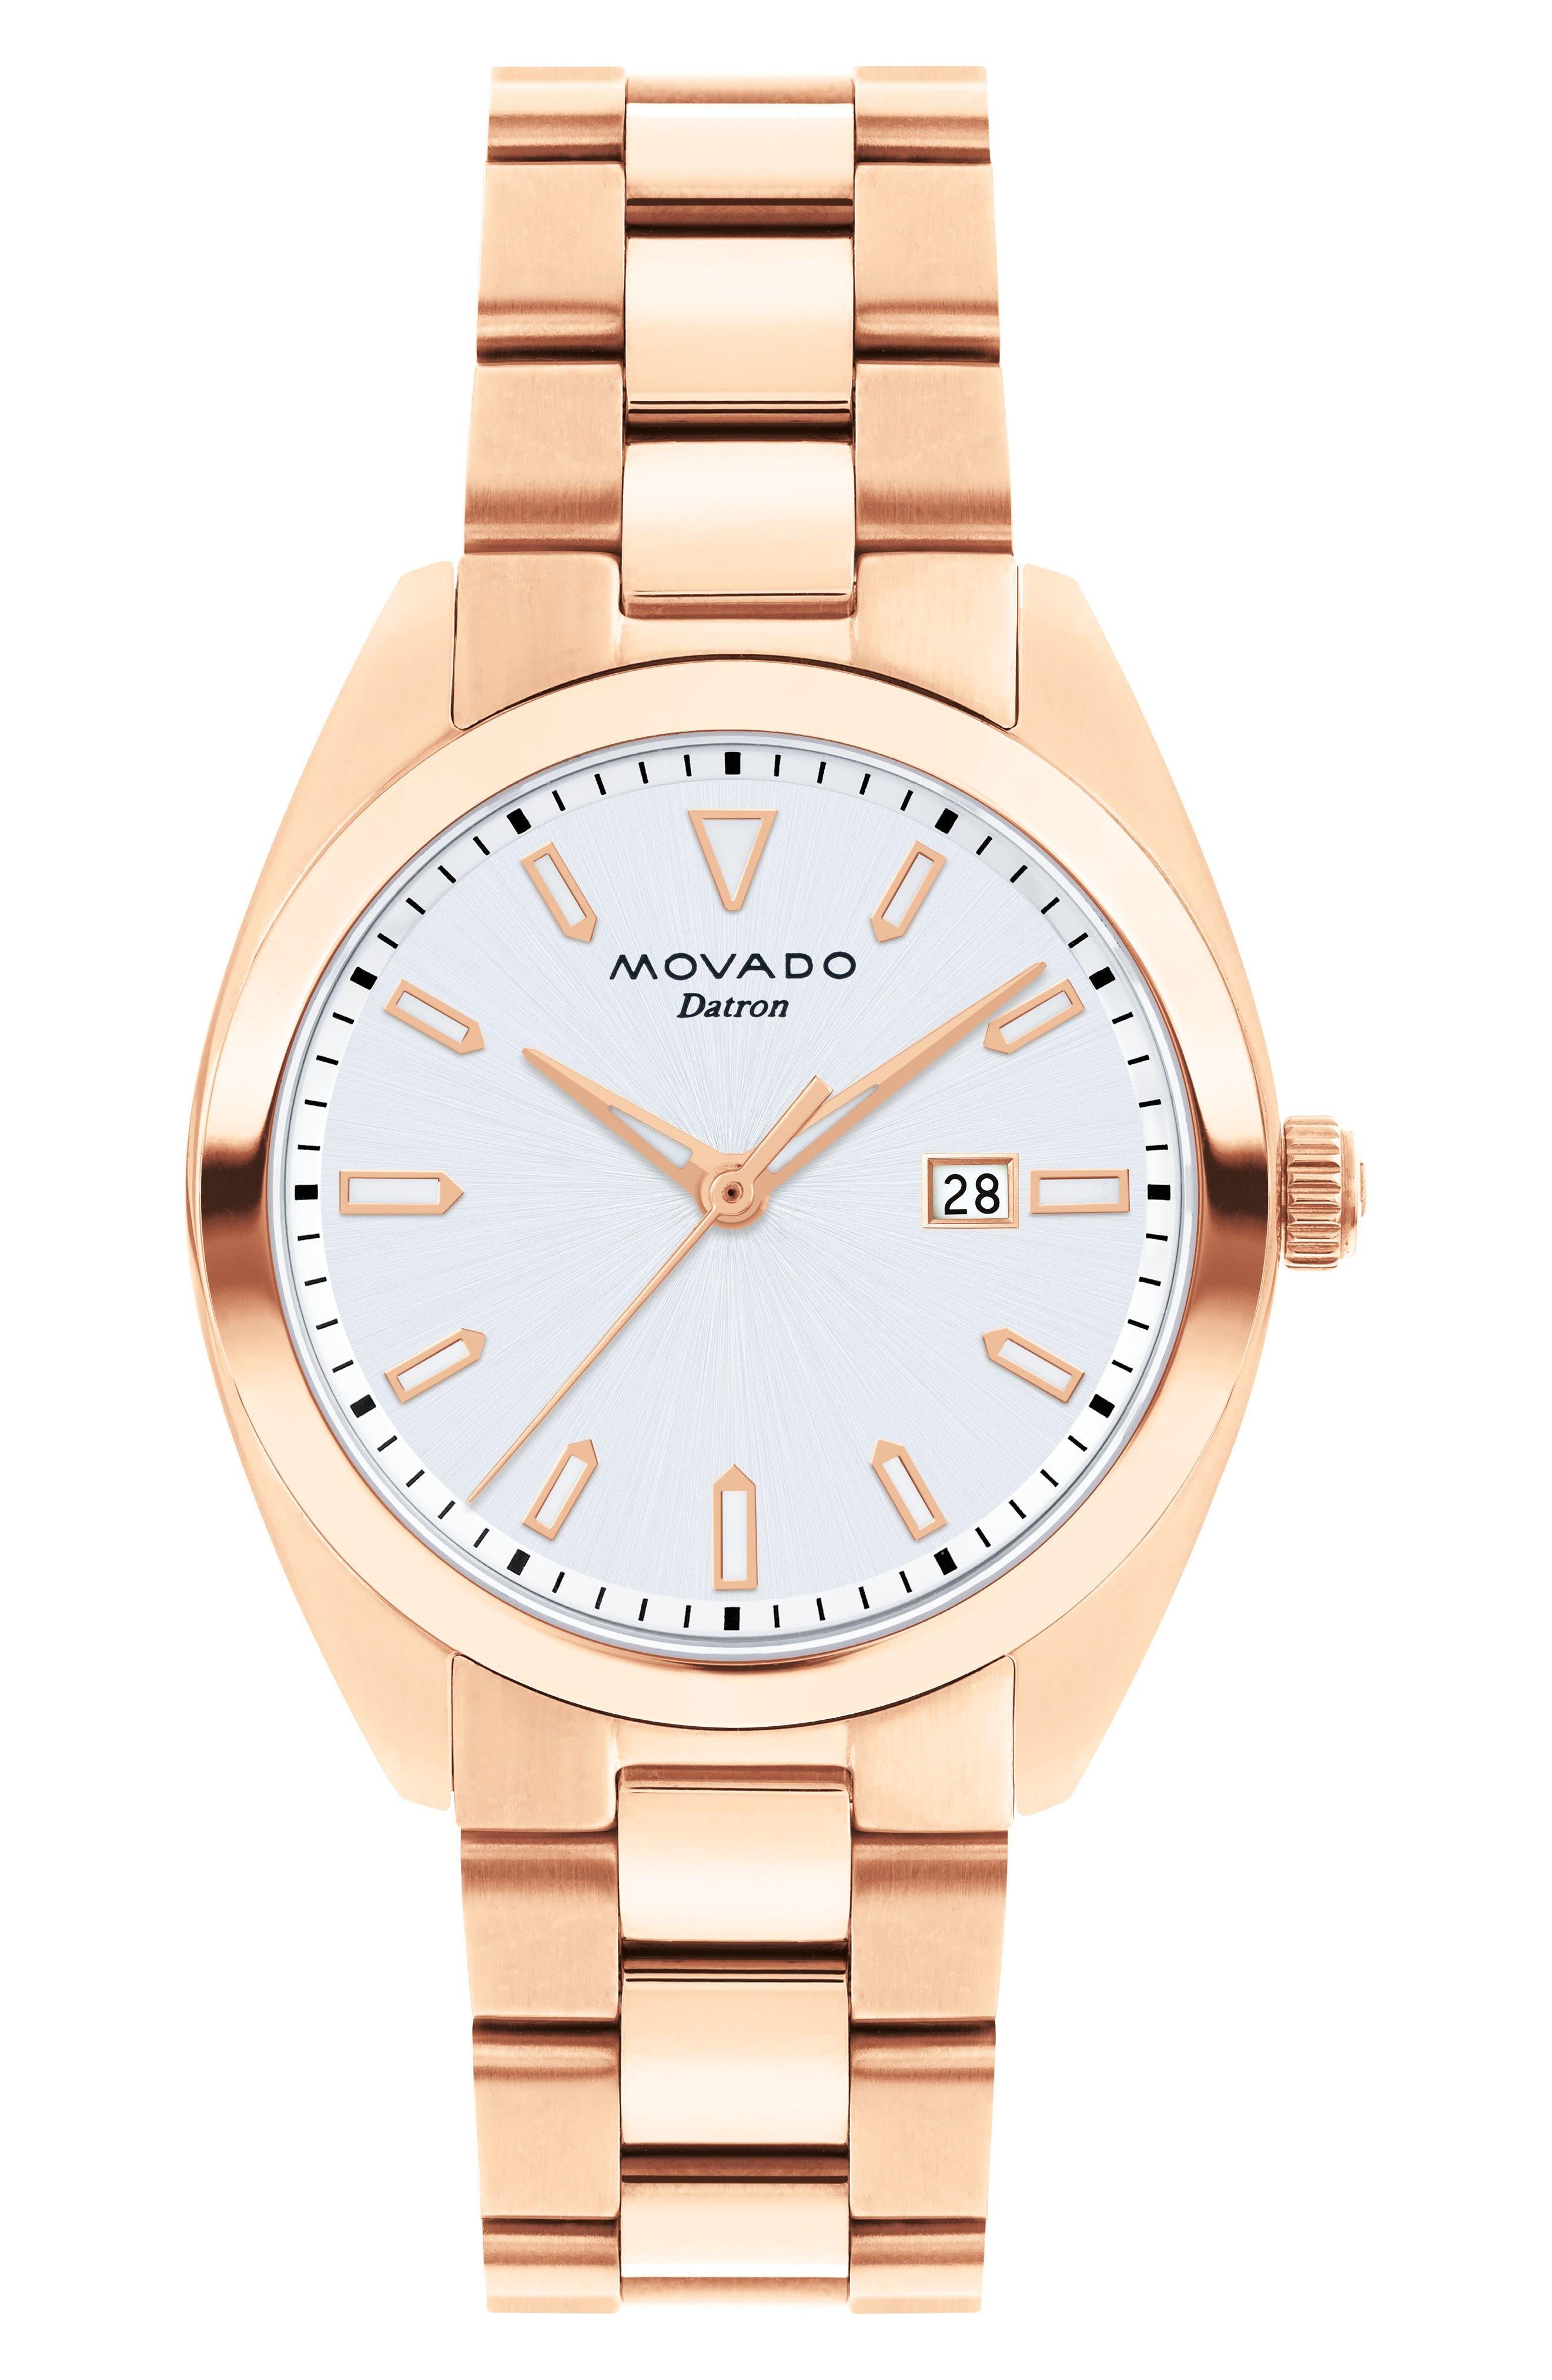 Main Image - Movado Heritage Datron Bracelet Watch, 31mm